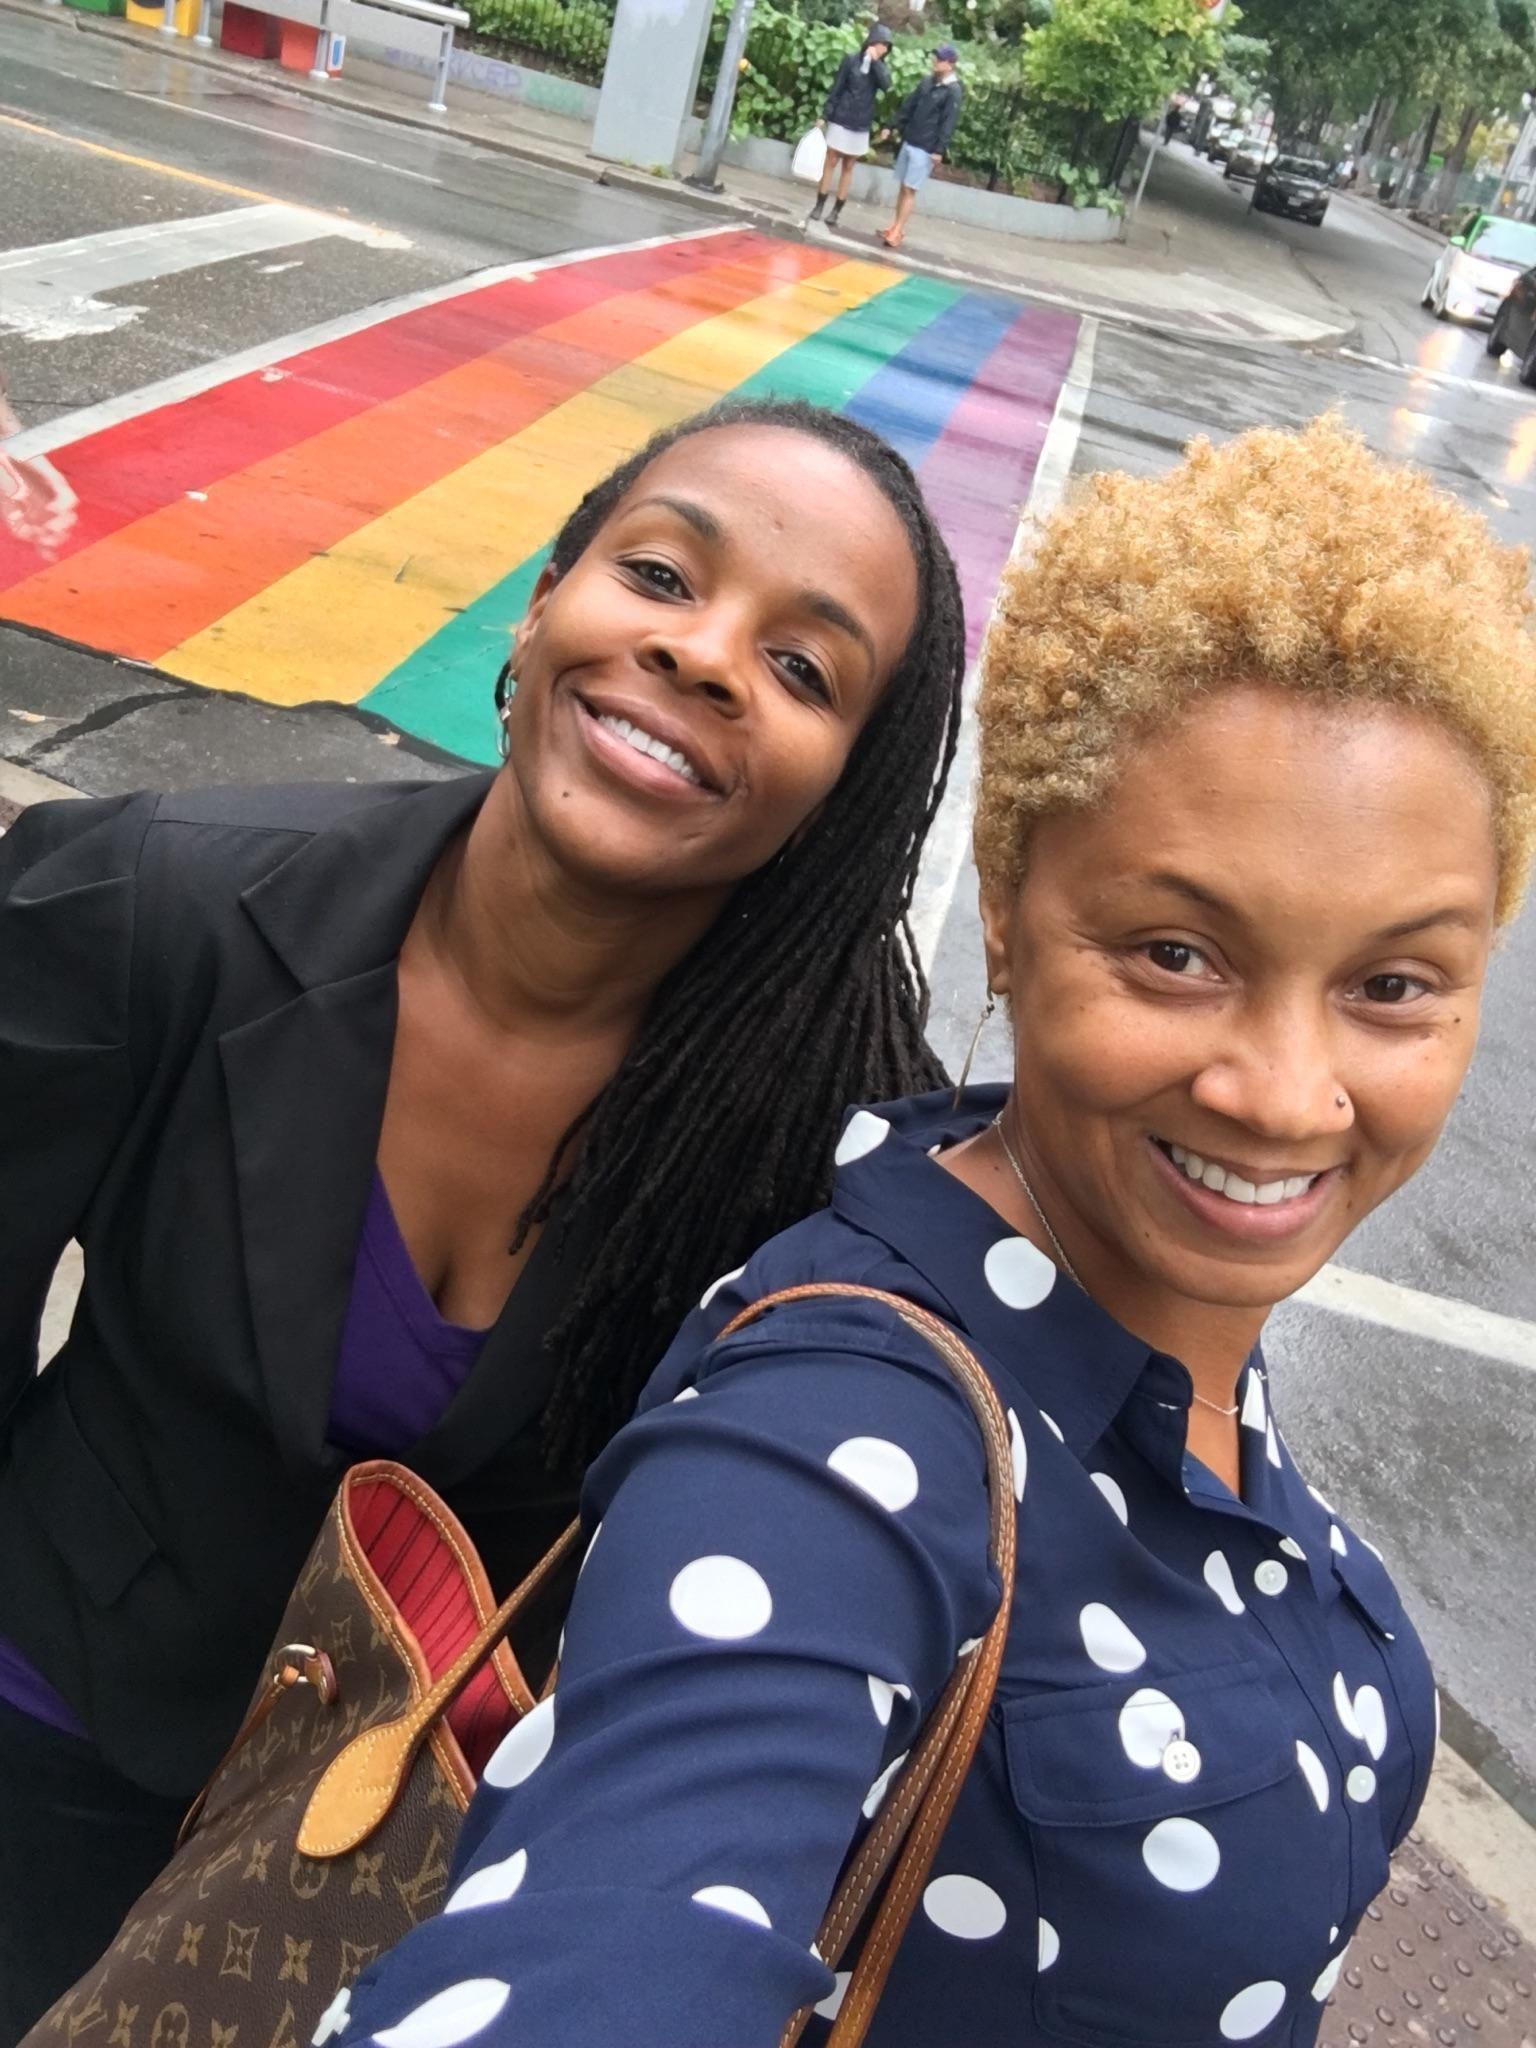 Www.black lesbians.com